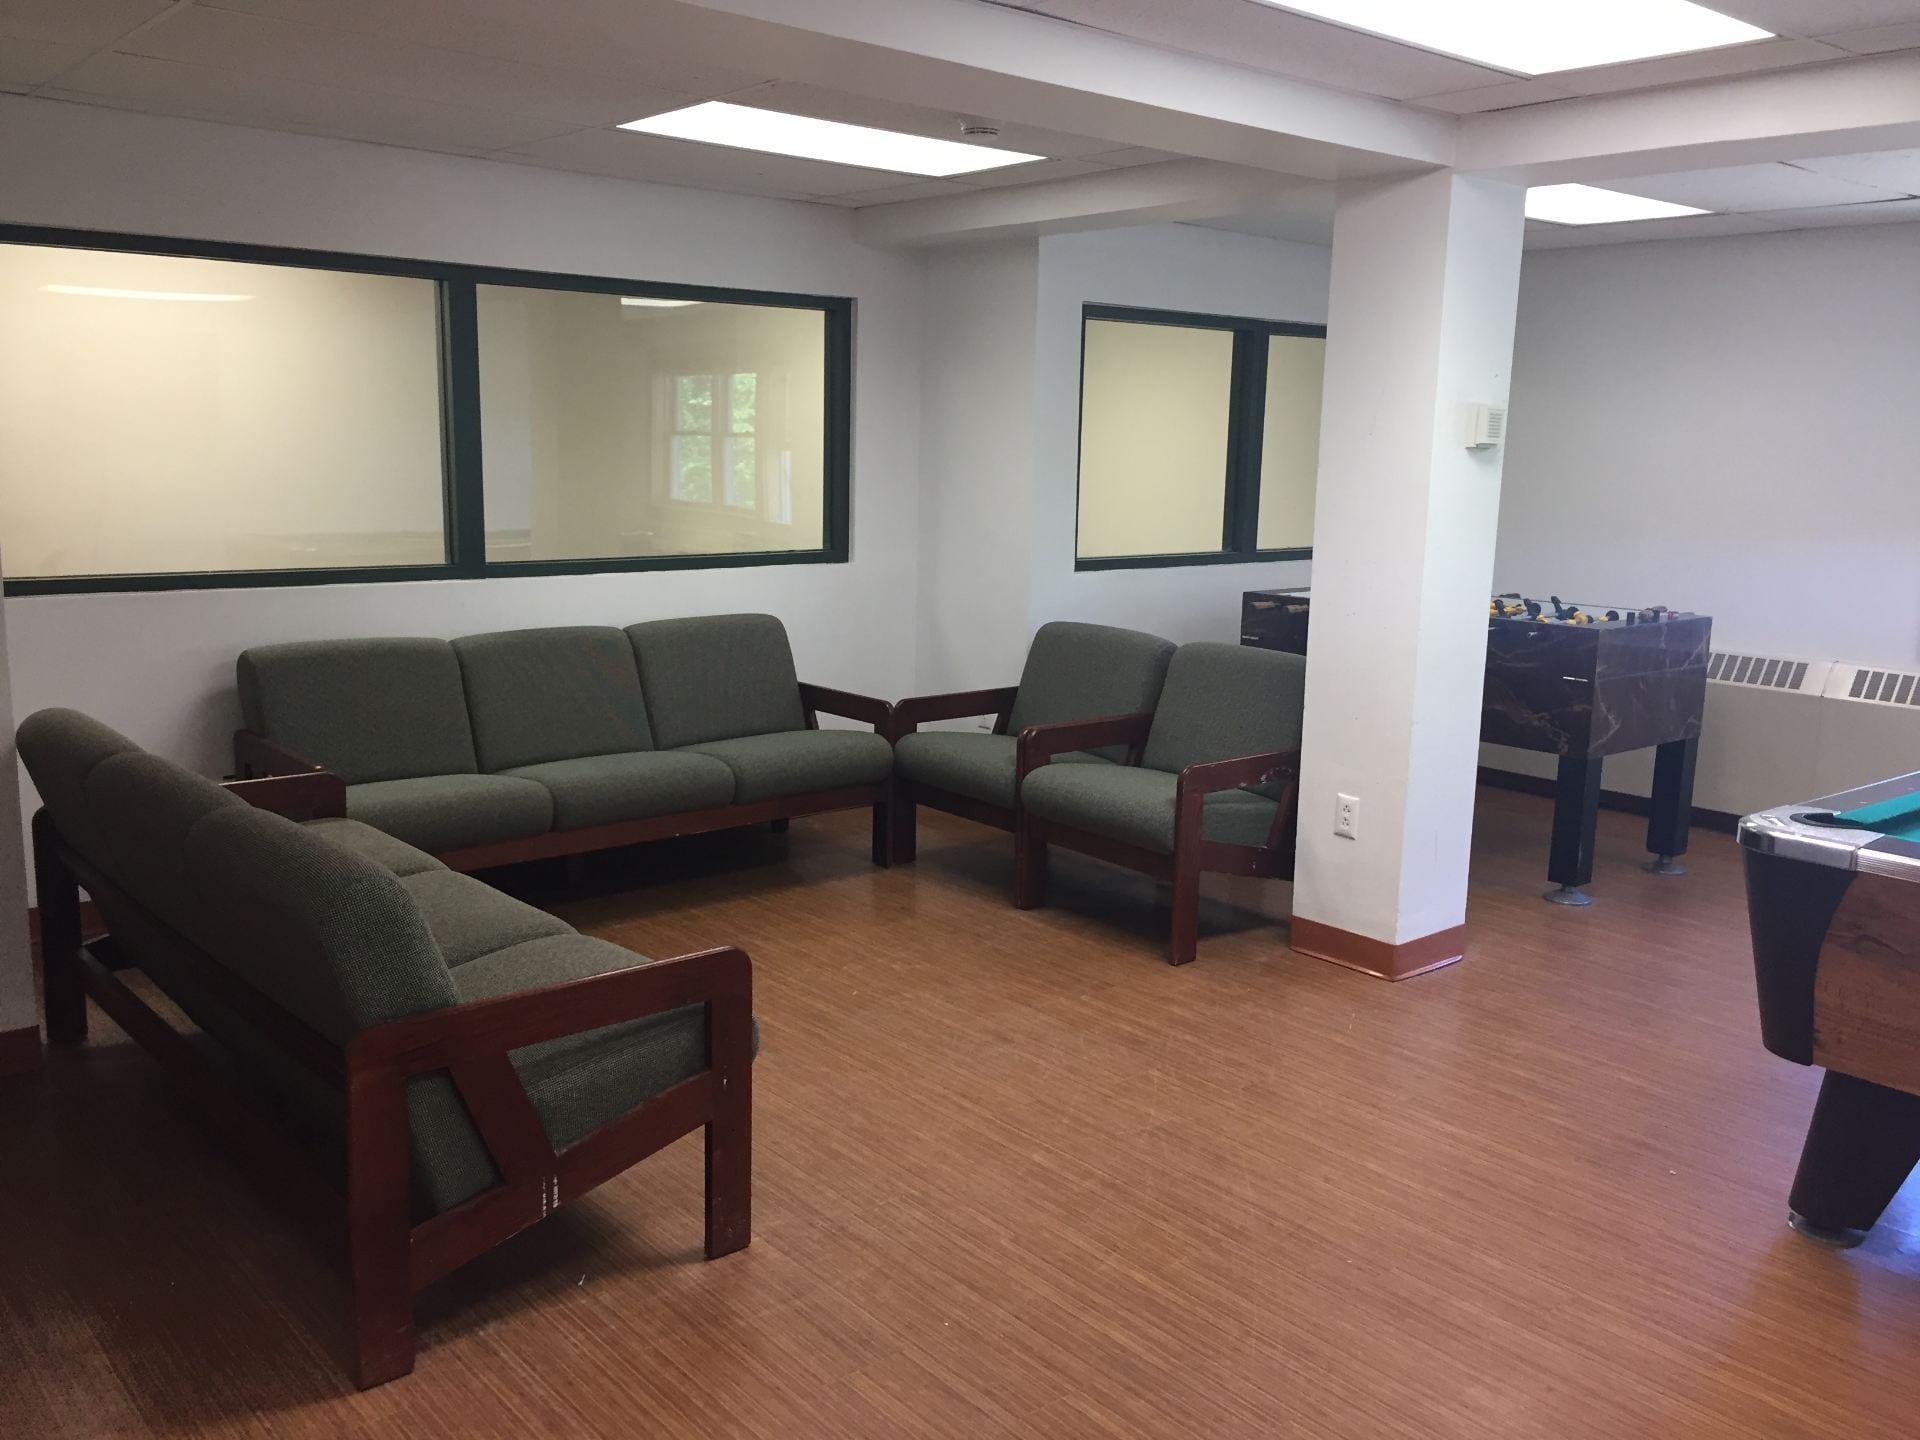 Saratoga Lounge